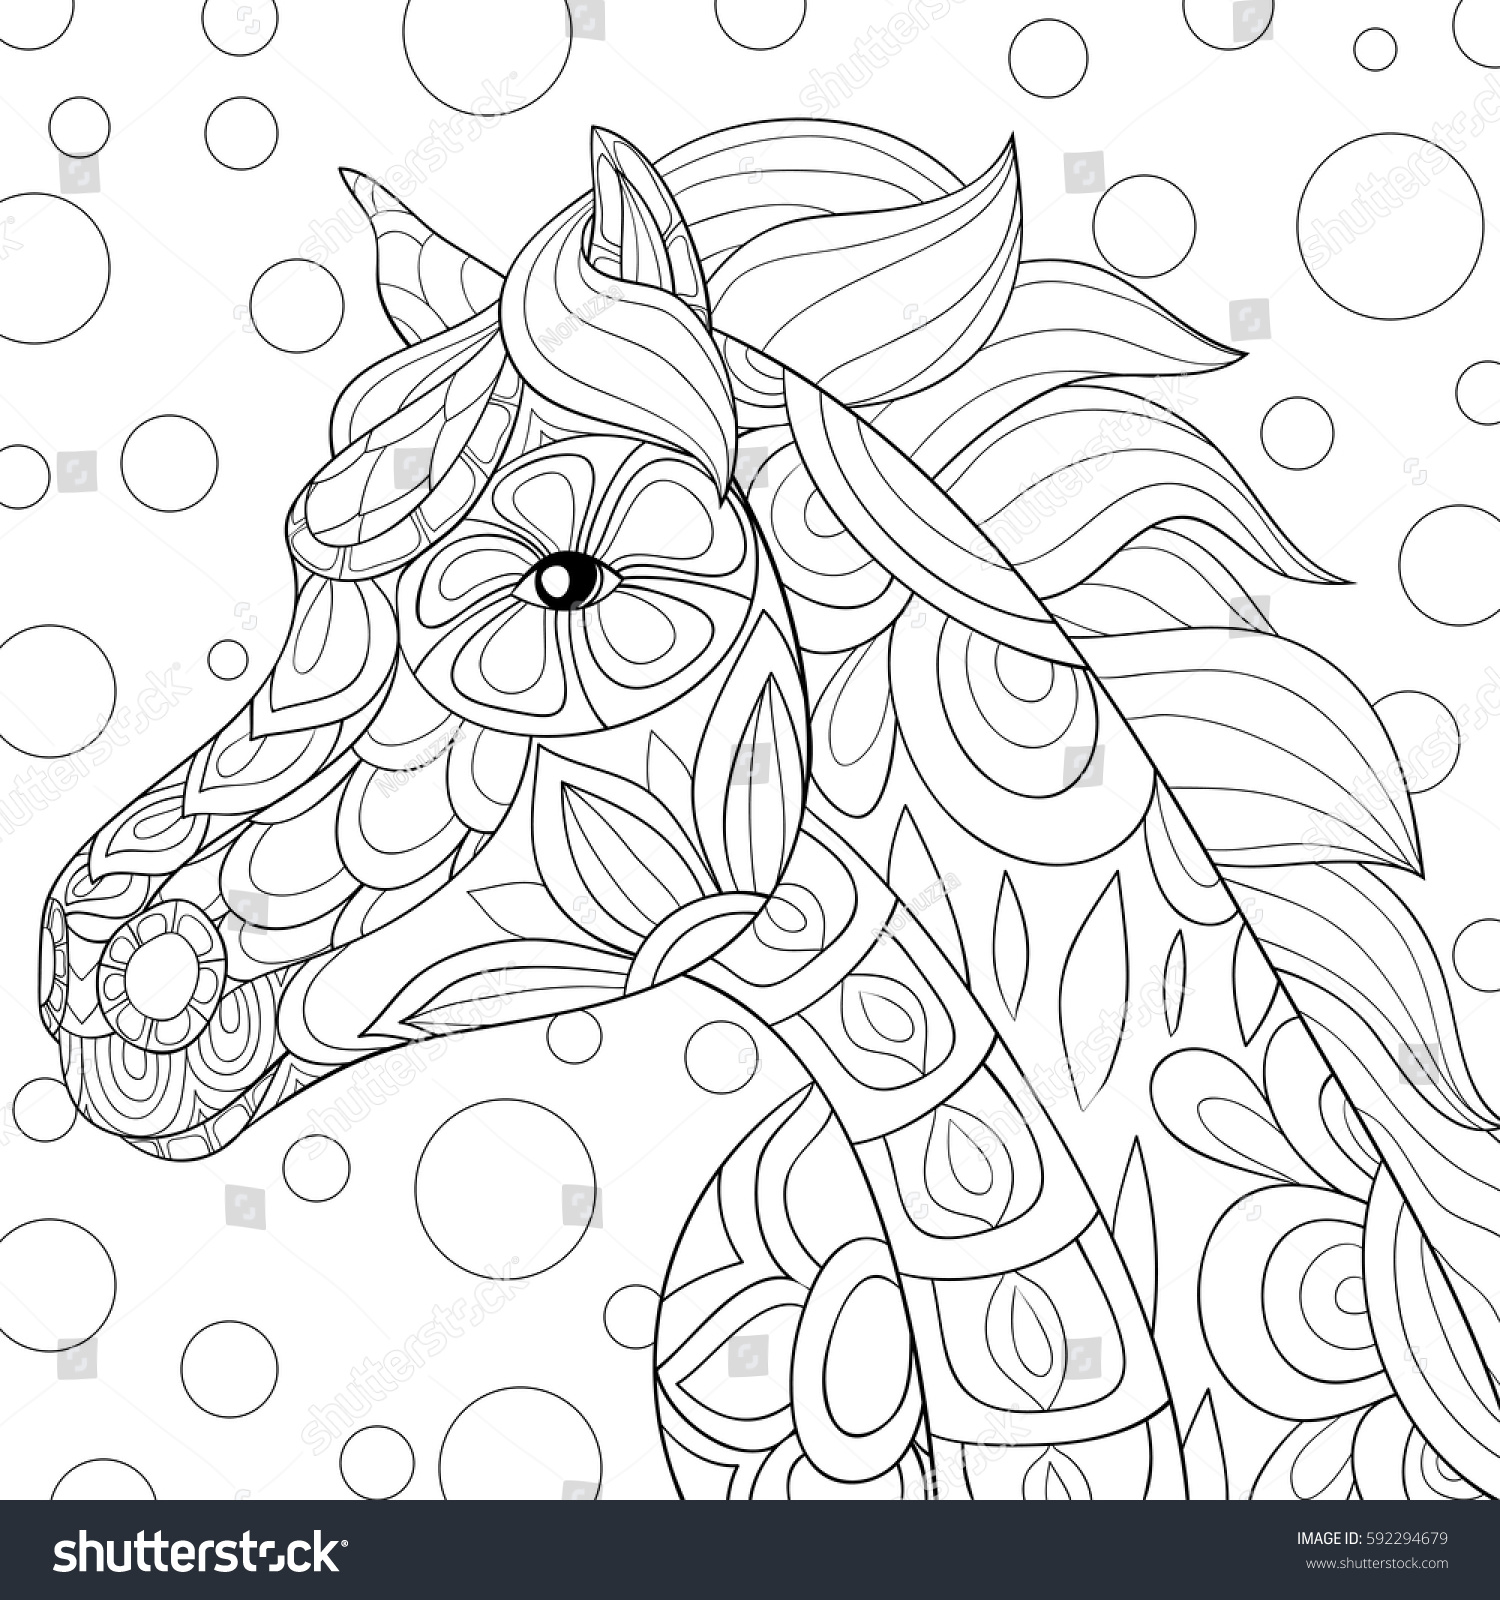 Coloring book horses - Adult Coloring Book Horse Zen Art Style Doodle